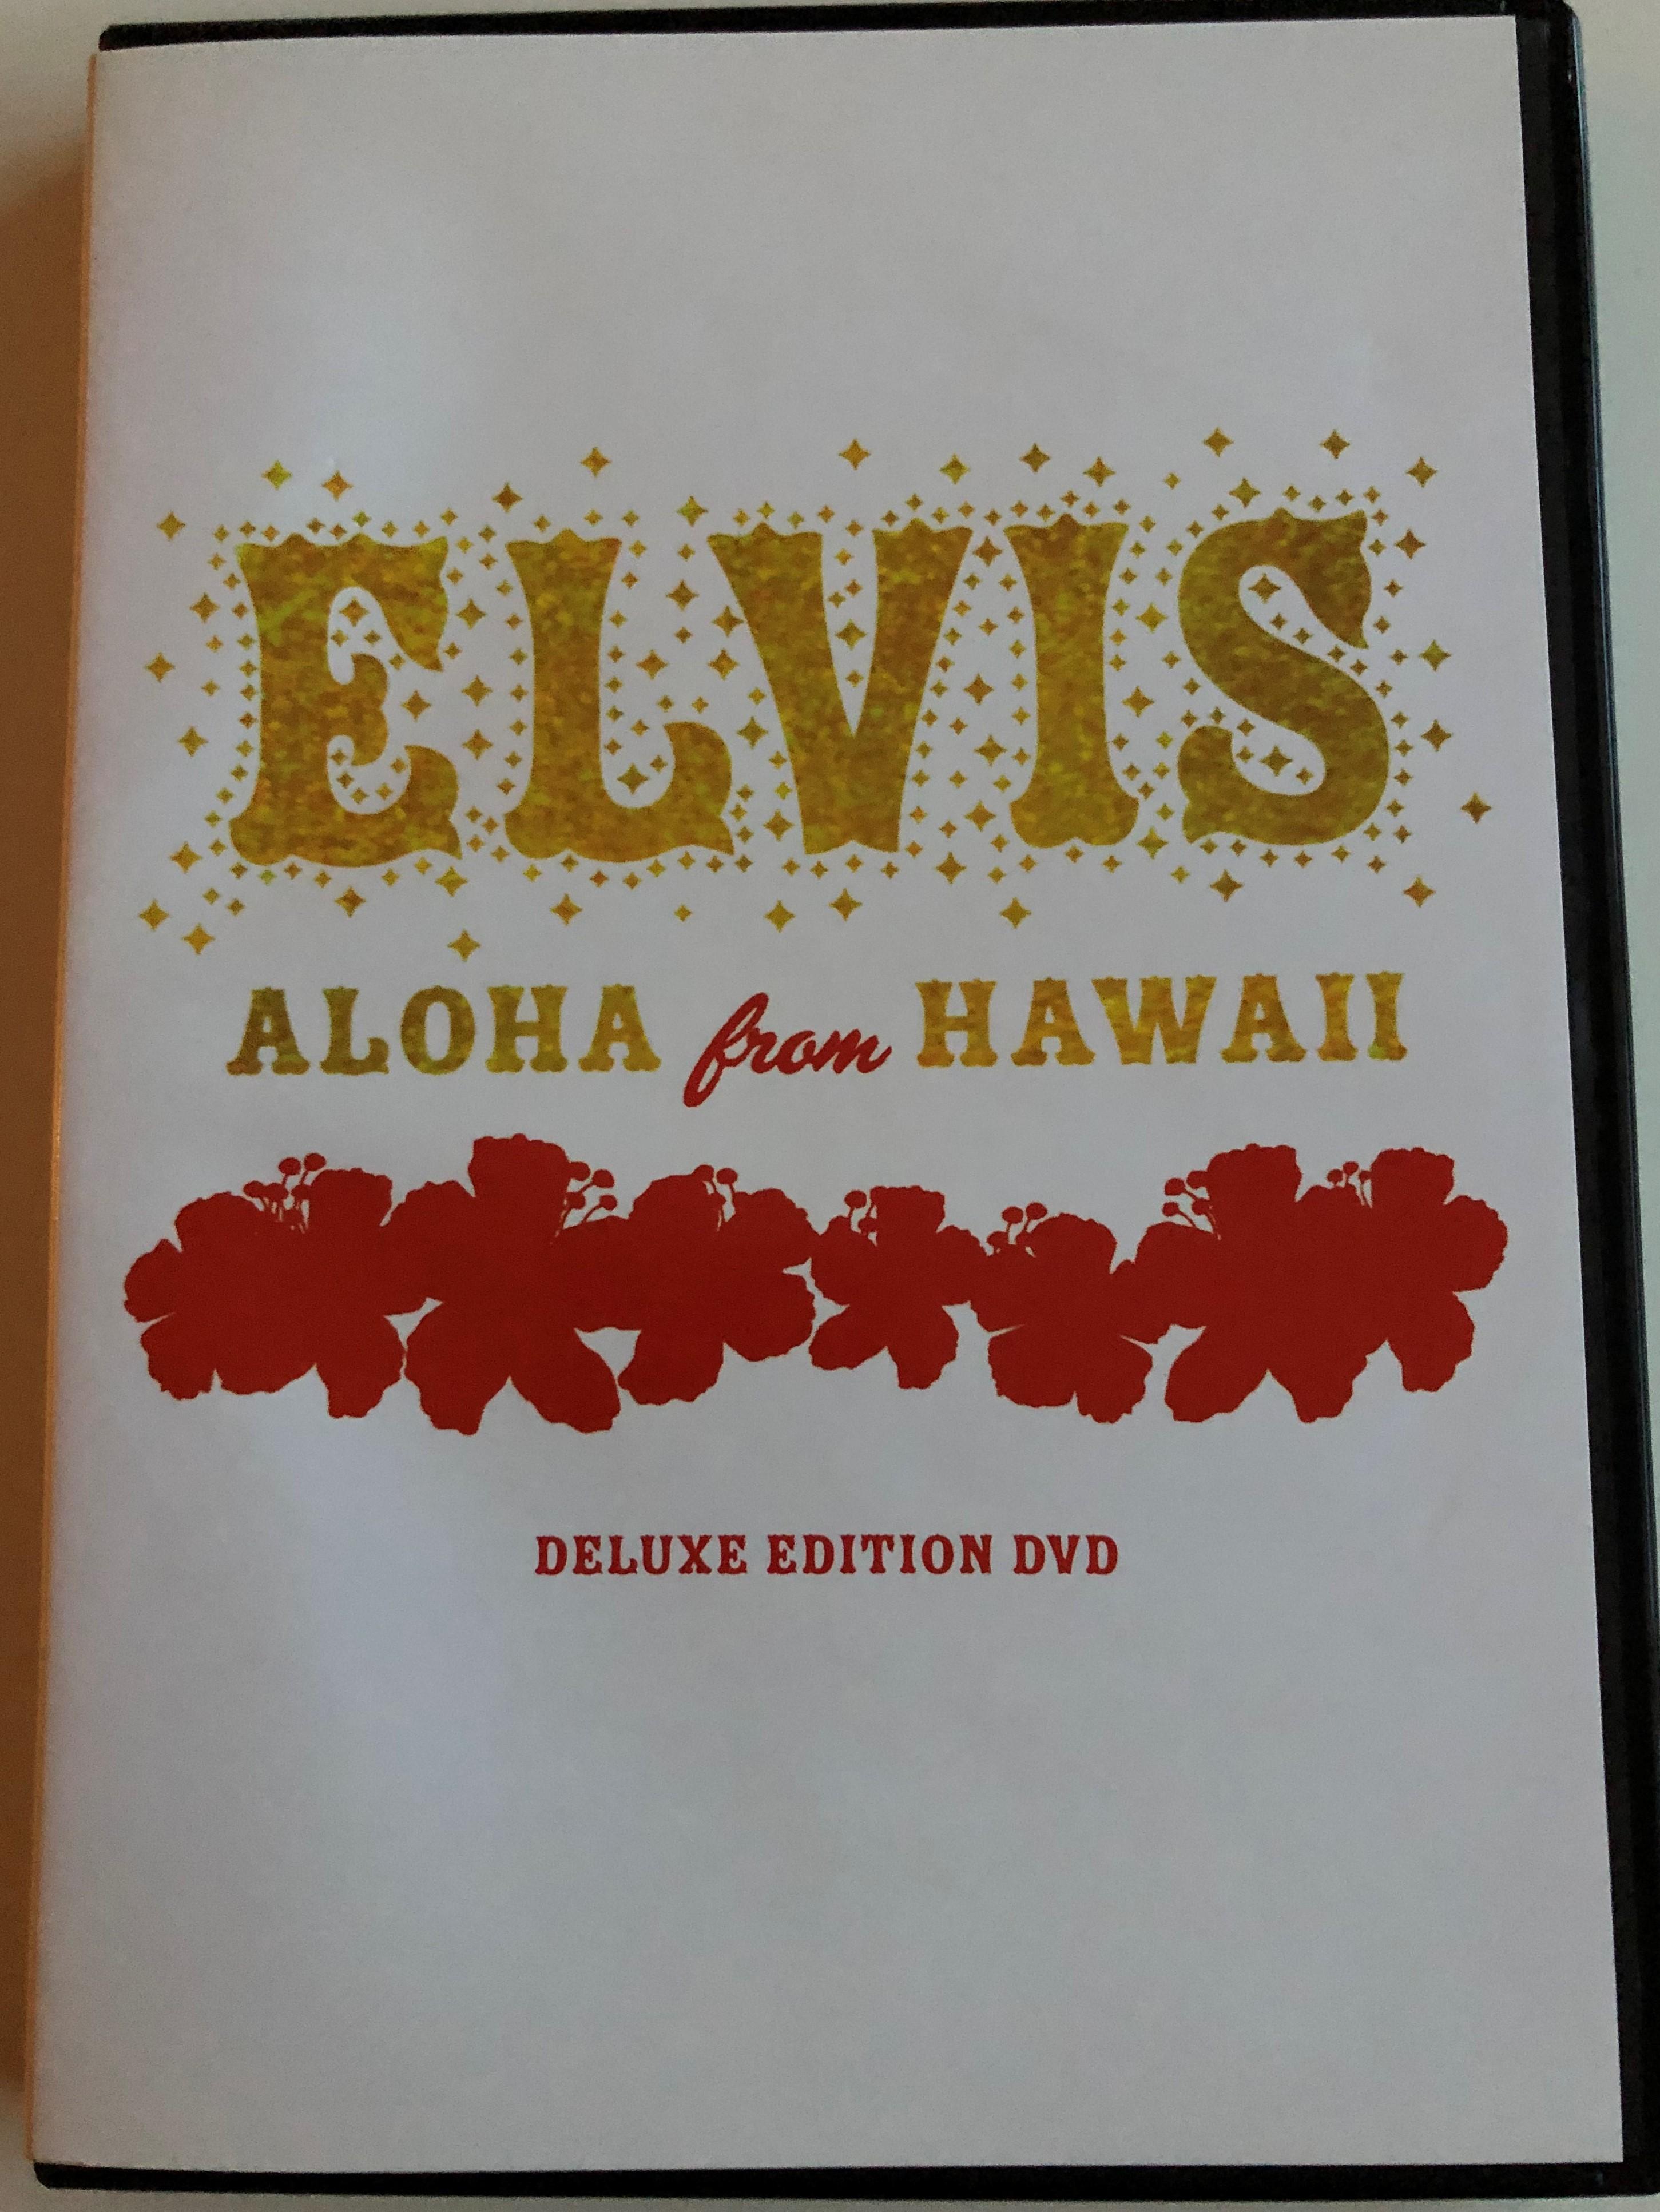 elvis-aloha-from-hawaii-deluxe-edition-dvd-2004-2x-dvd-set-1.jpg